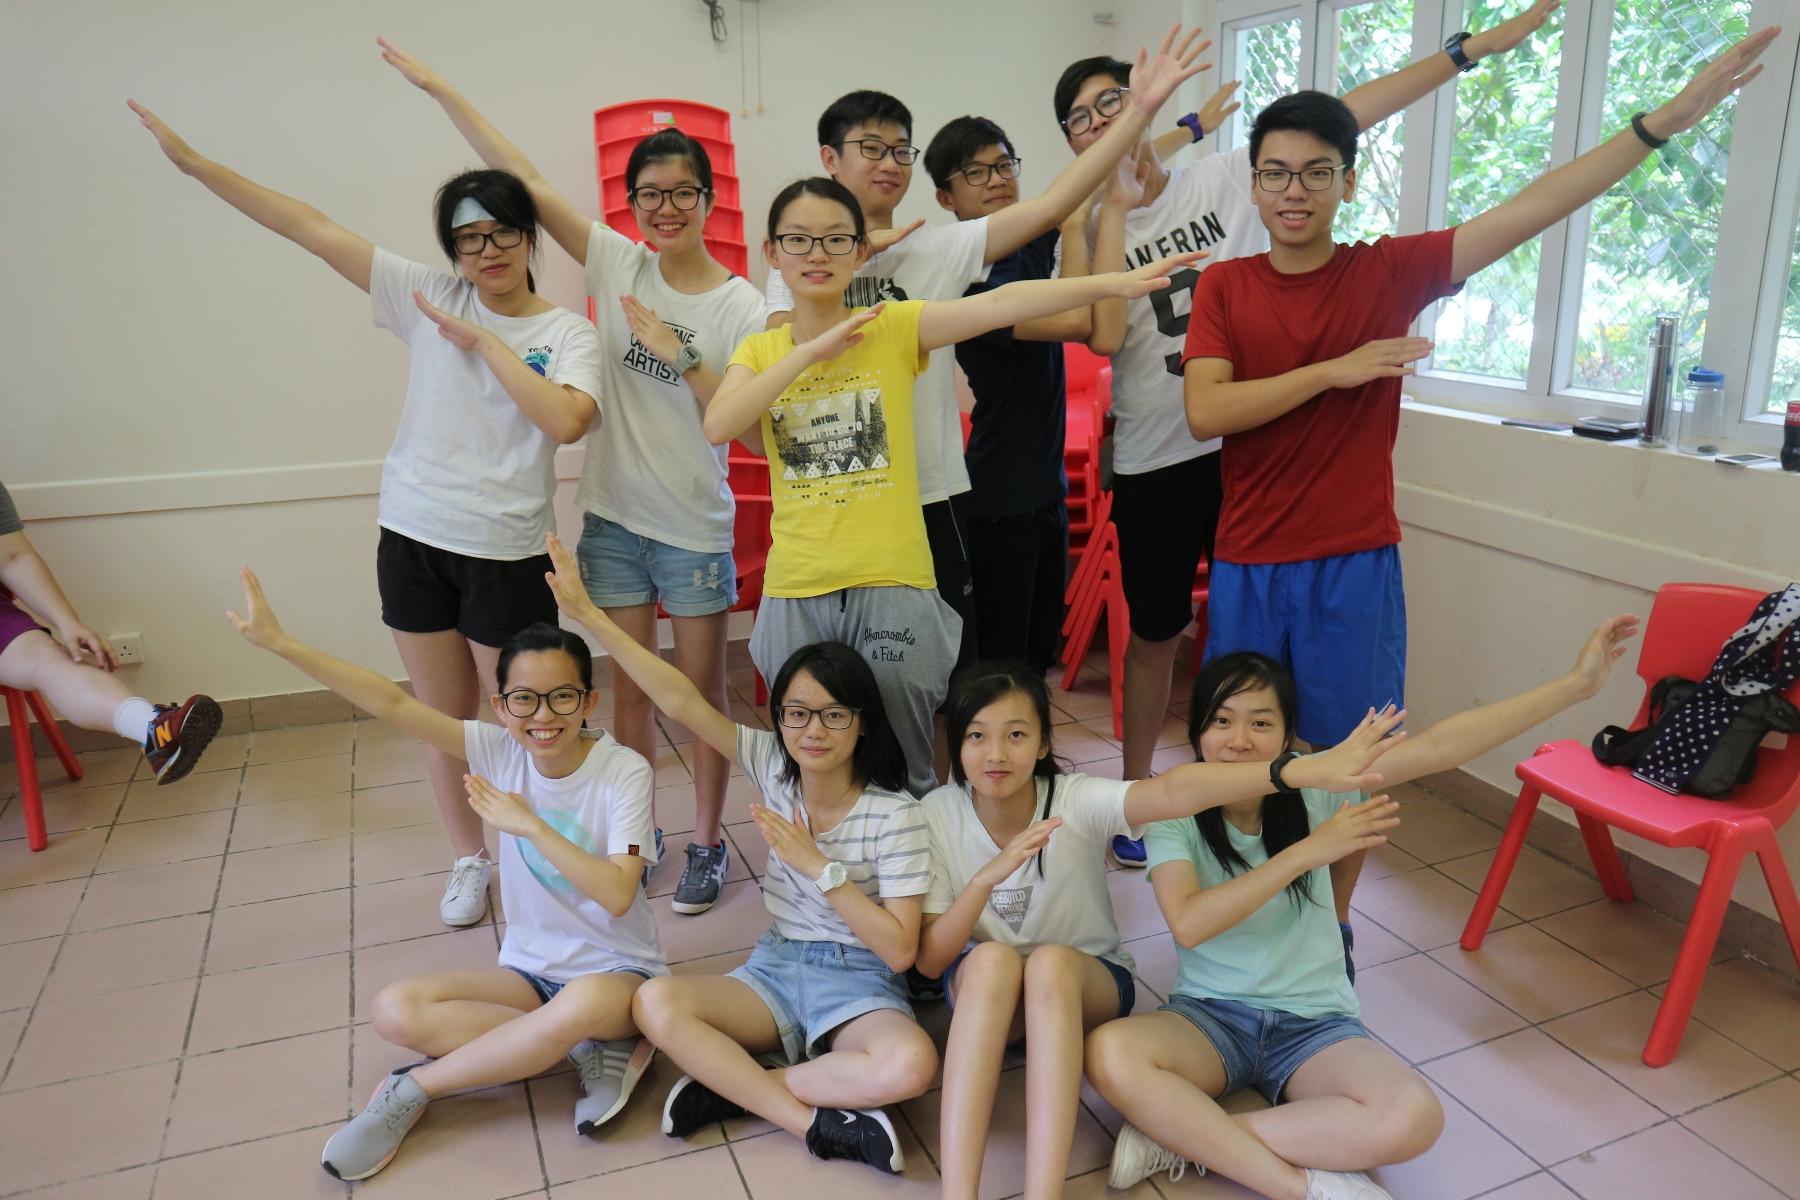 http://www.npc.edu.hk/sites/default/files/img_3400.jpg